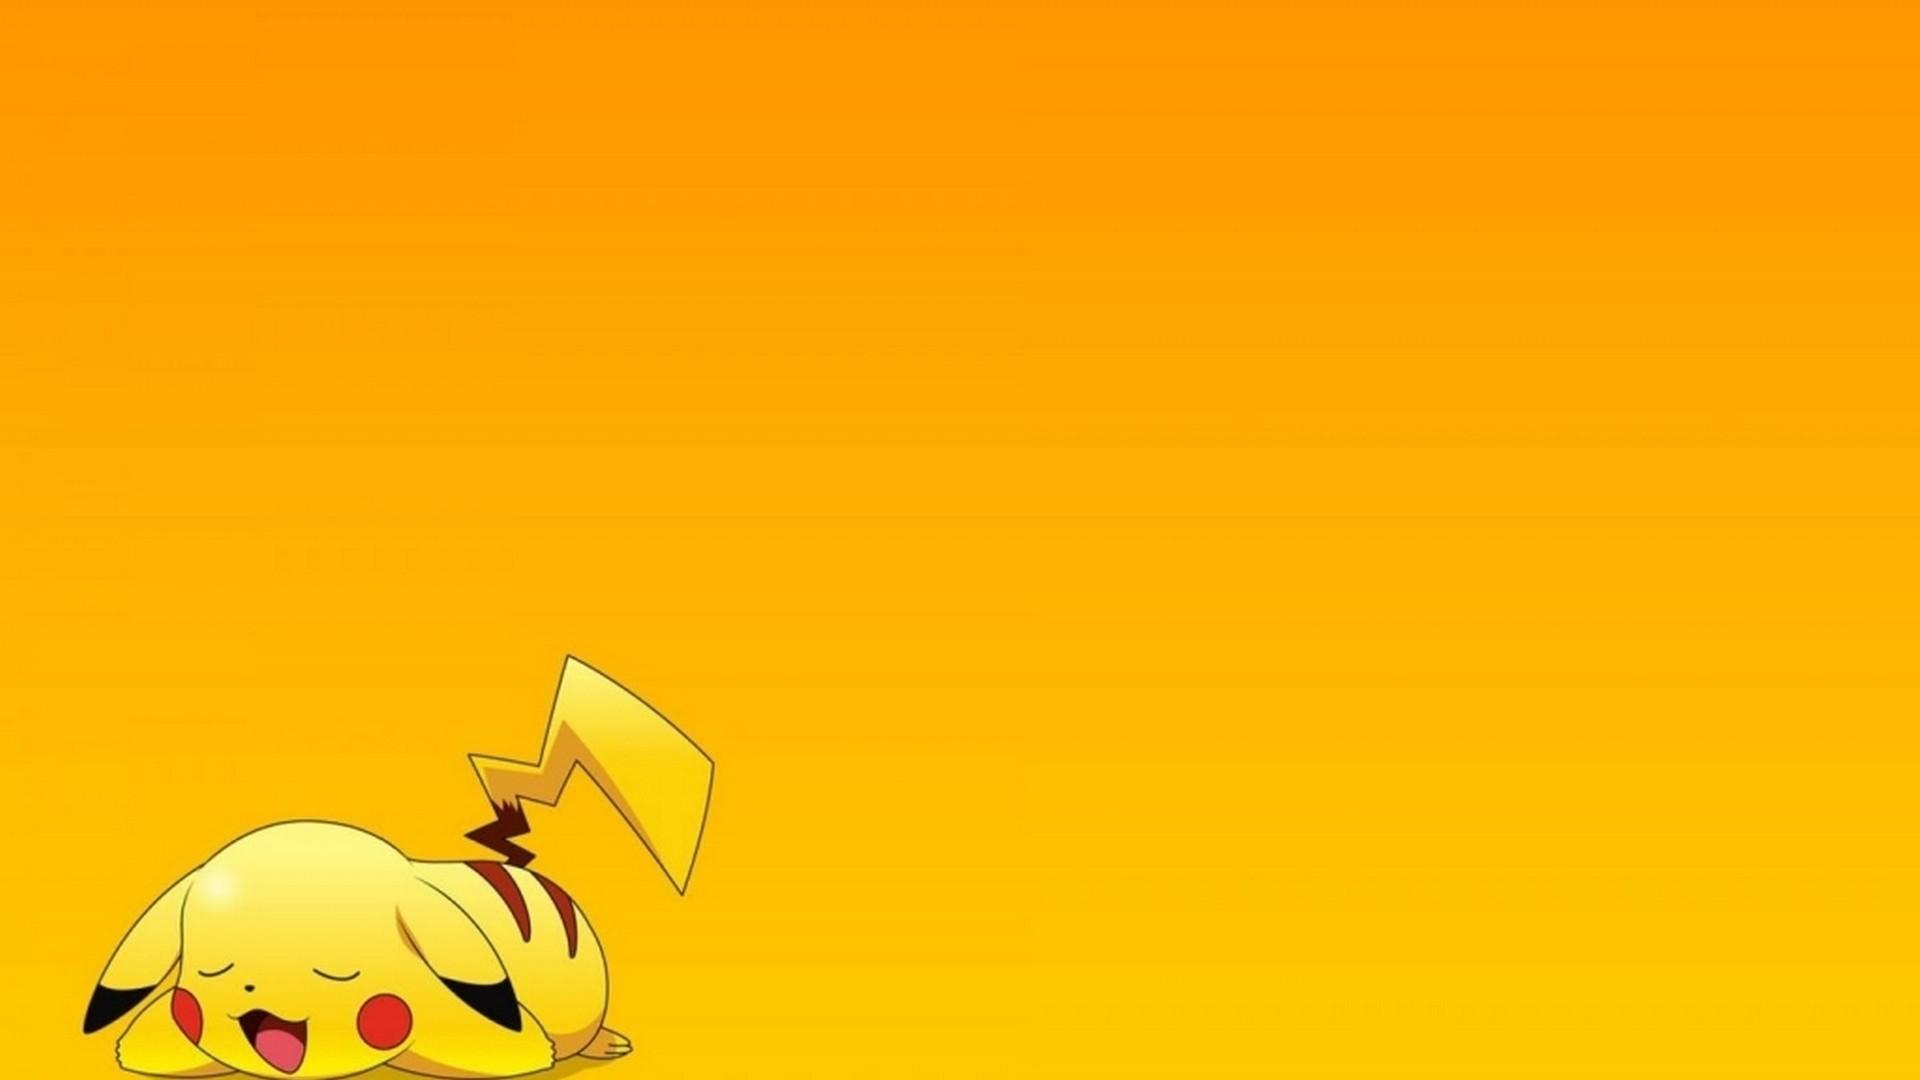 Cute Yellow Image